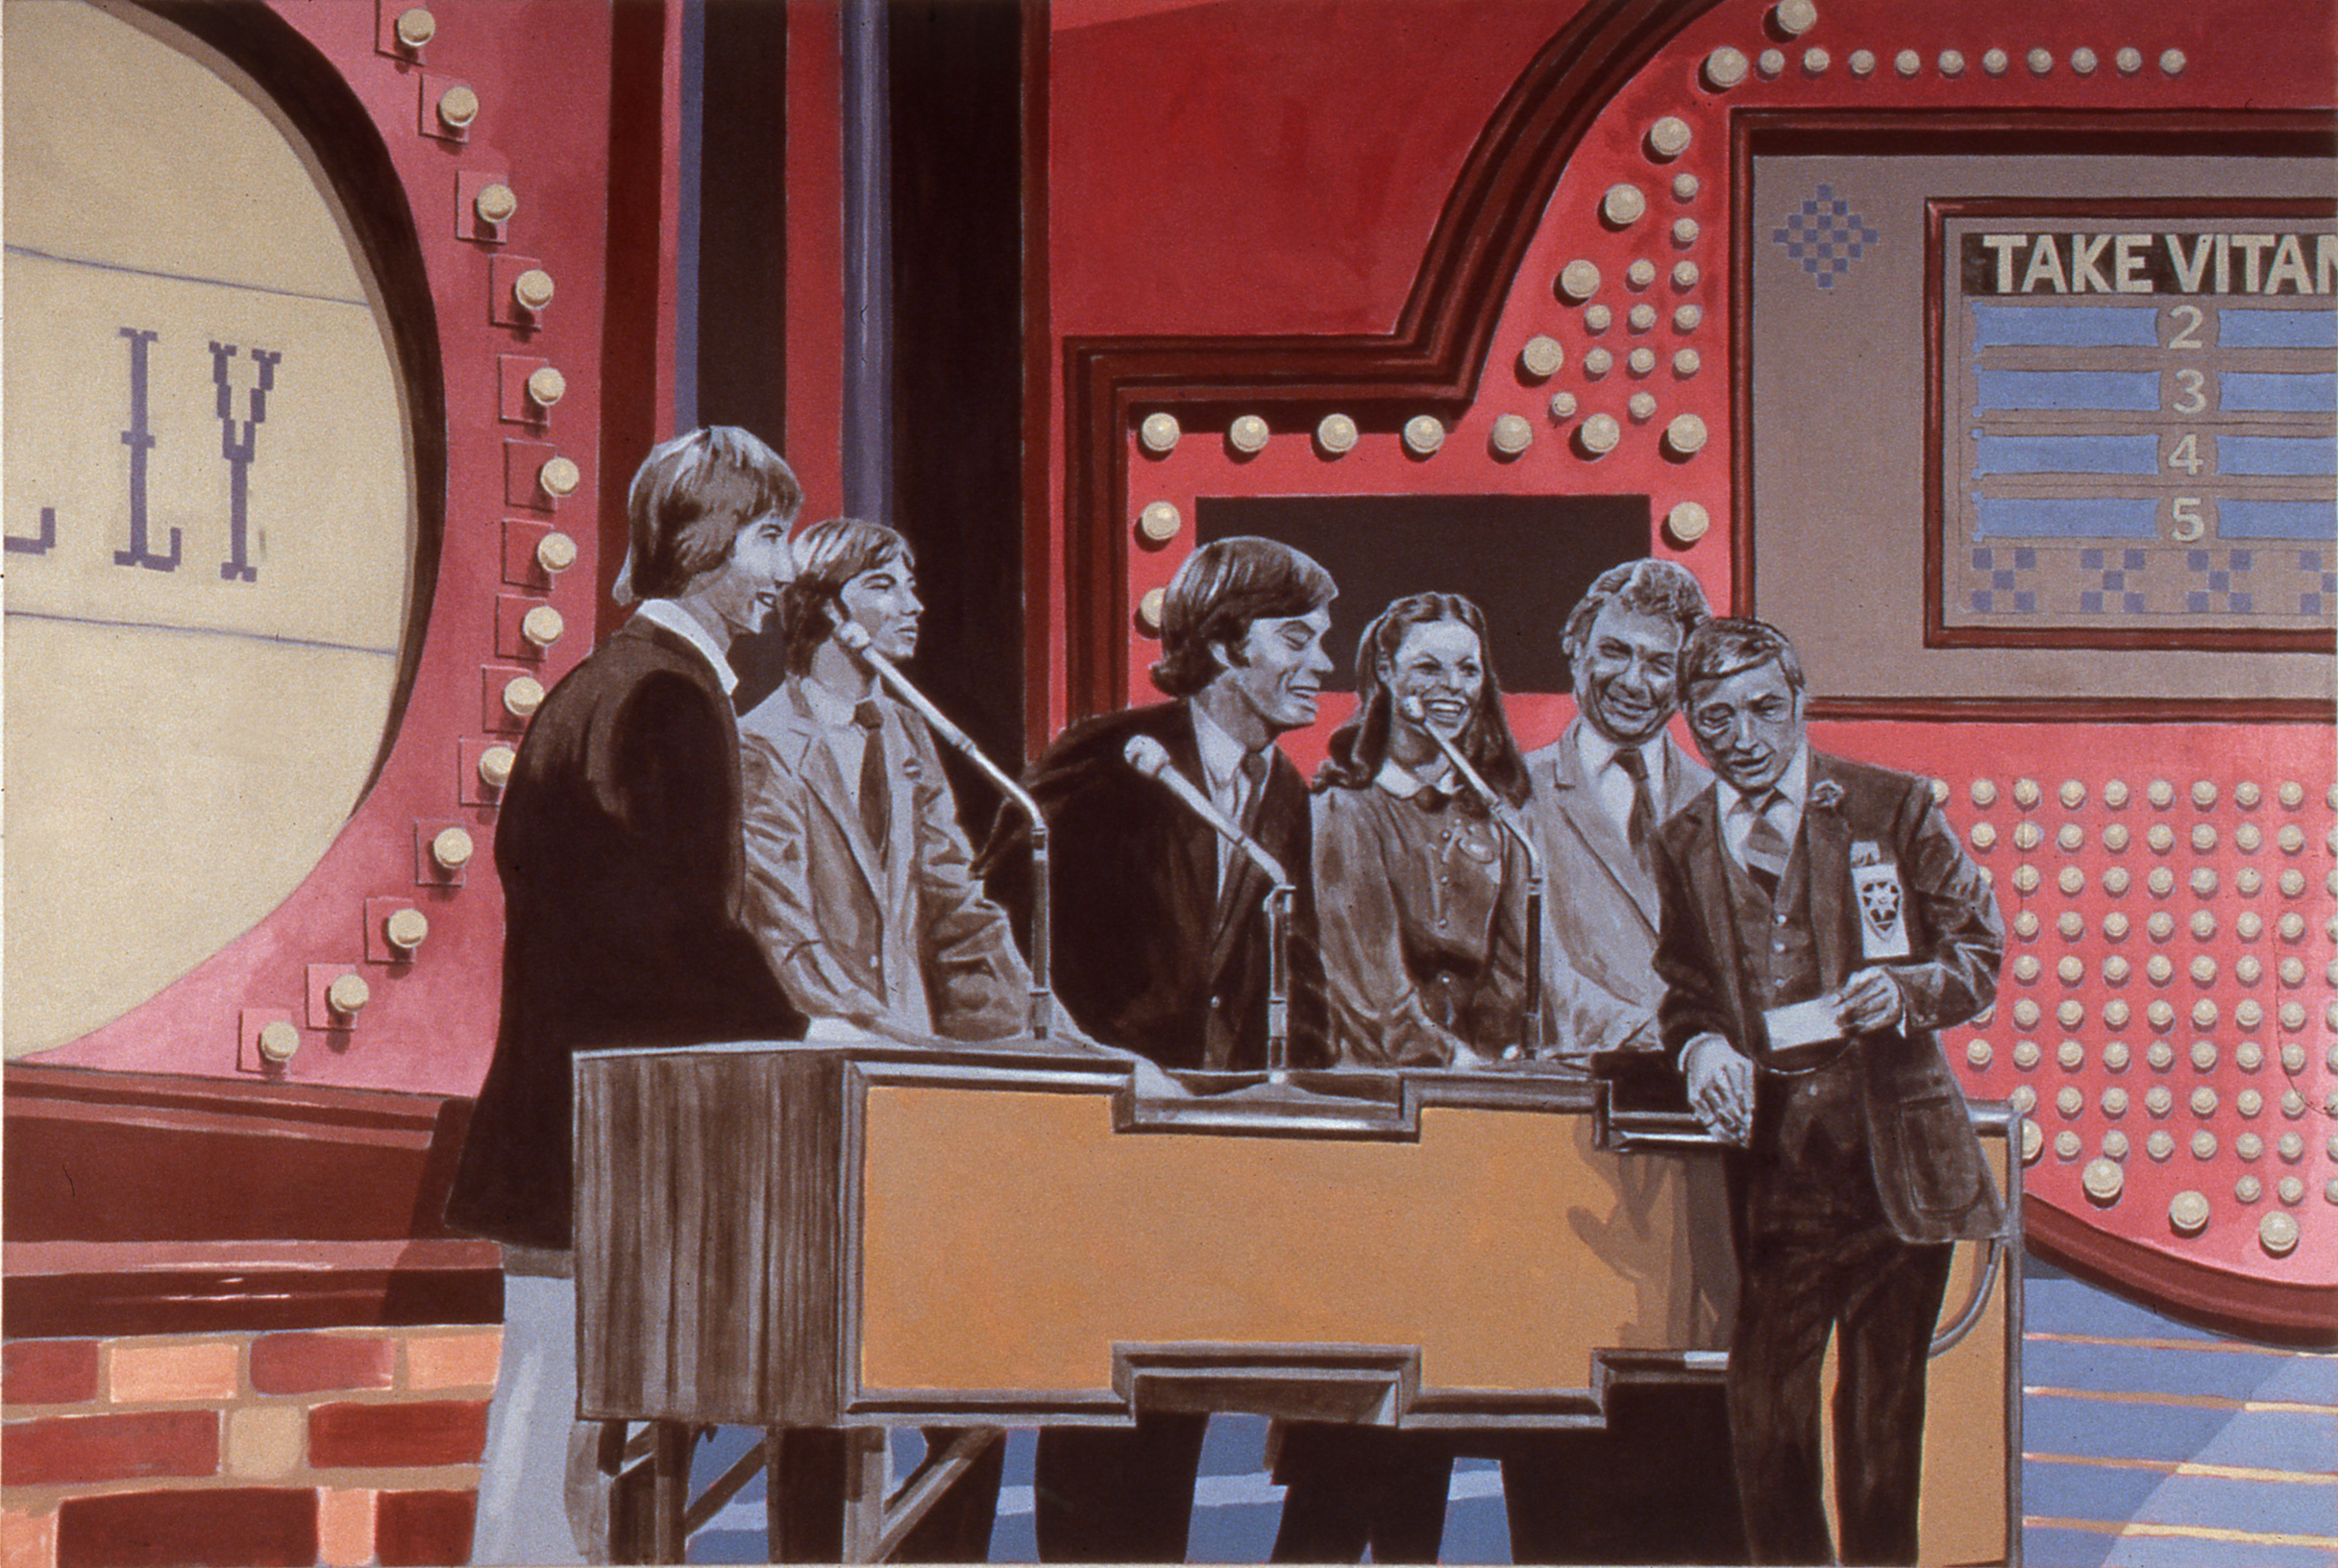 Family Feud, 1995 acrylic on canvas 137,2 x 203,2 cm - 54 x 80 inches